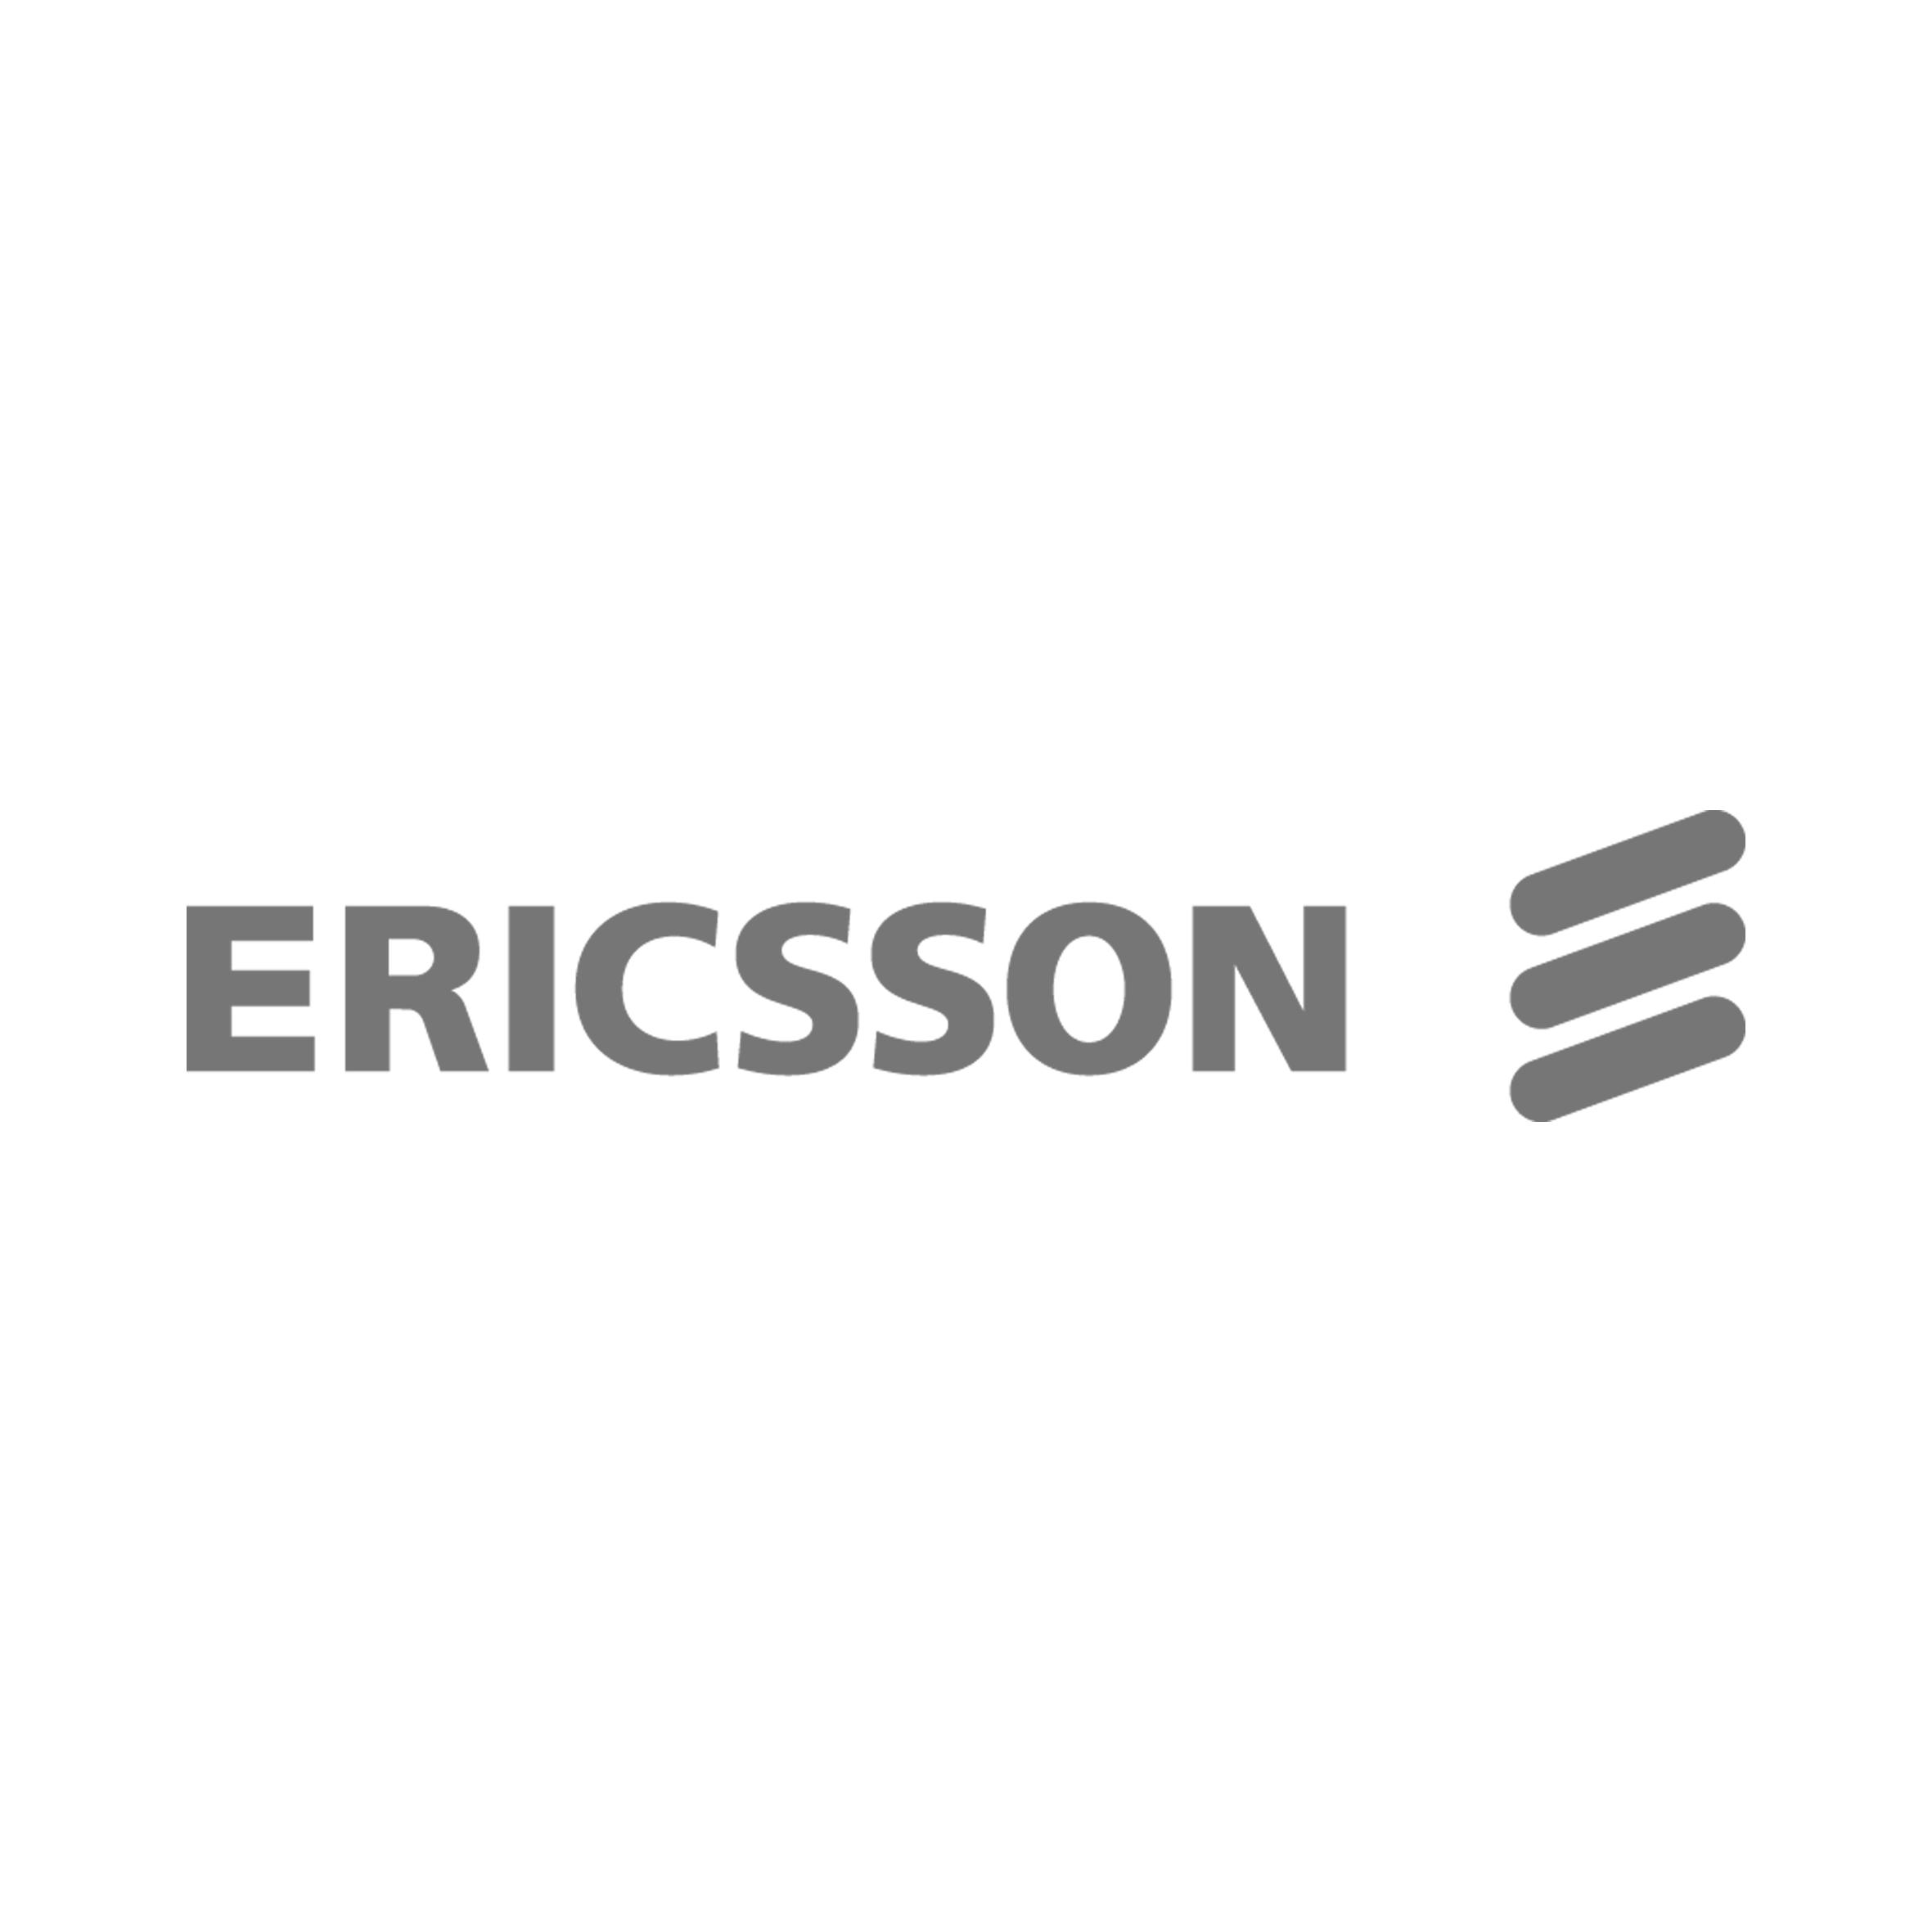 Ericsson2.jpg